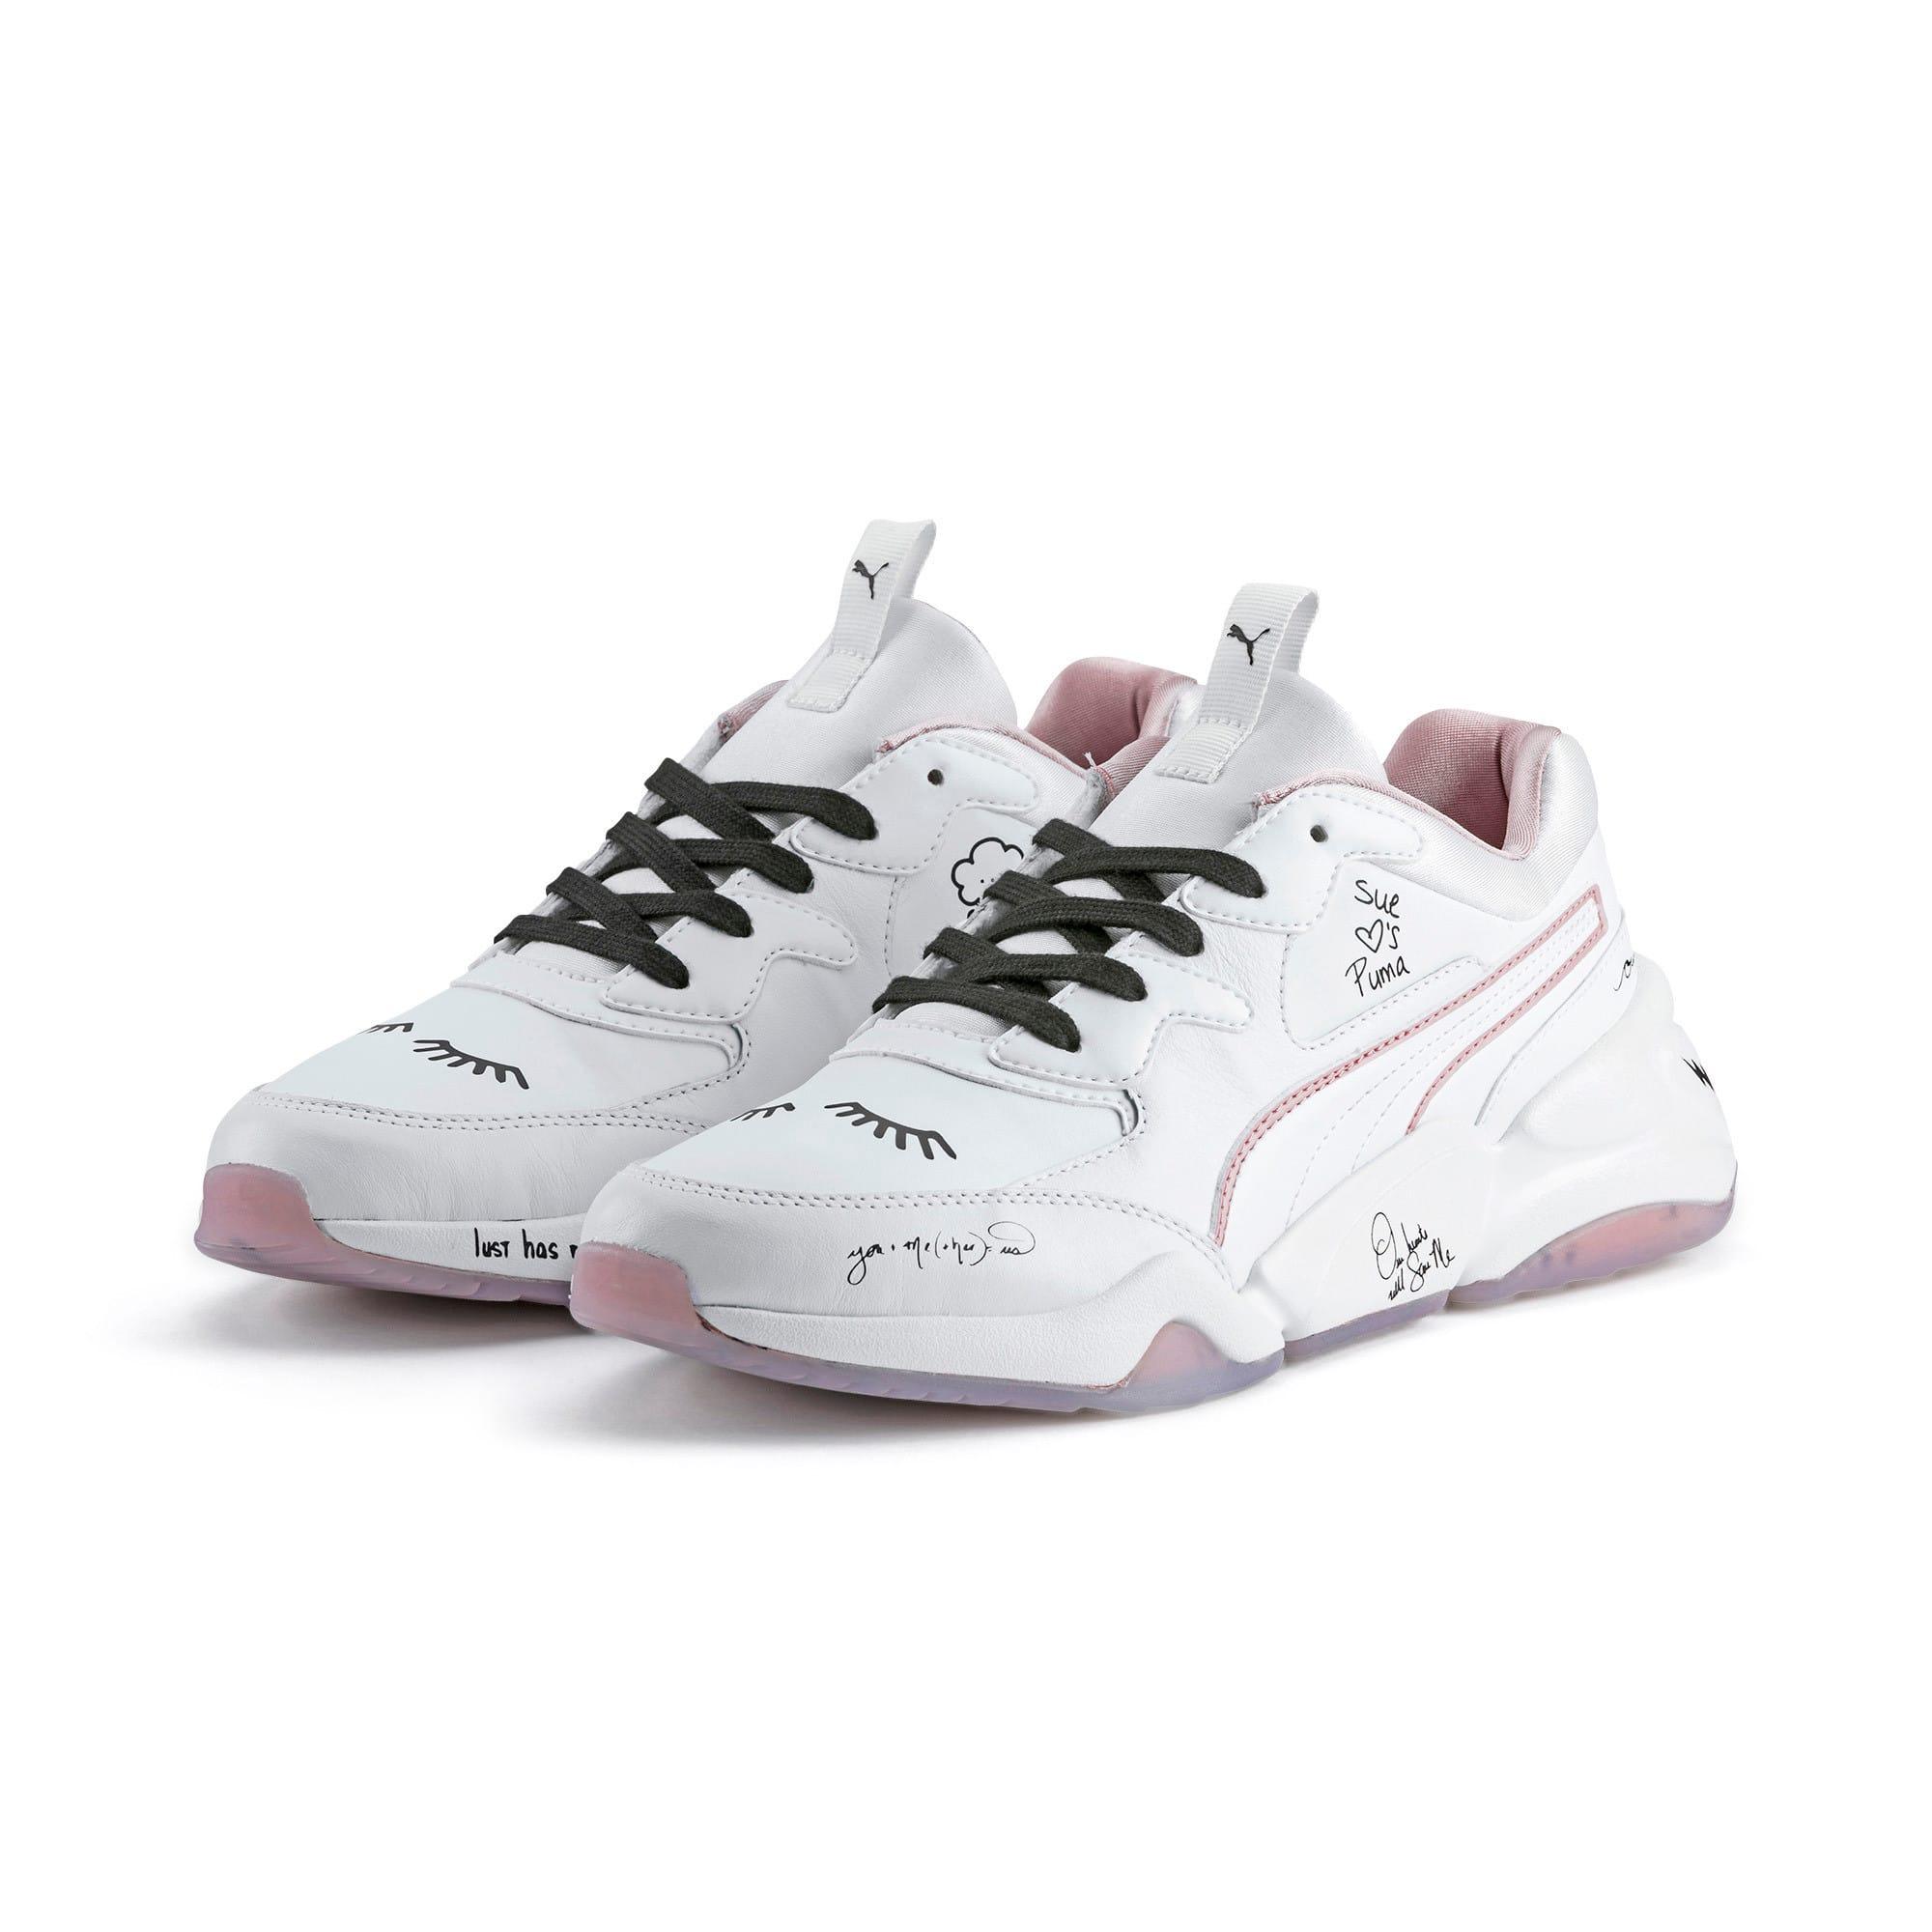 Thumbnail 7 of PUMA x SUE TSAI Nova Women's Sneakers, Bright White-Bright White, medium